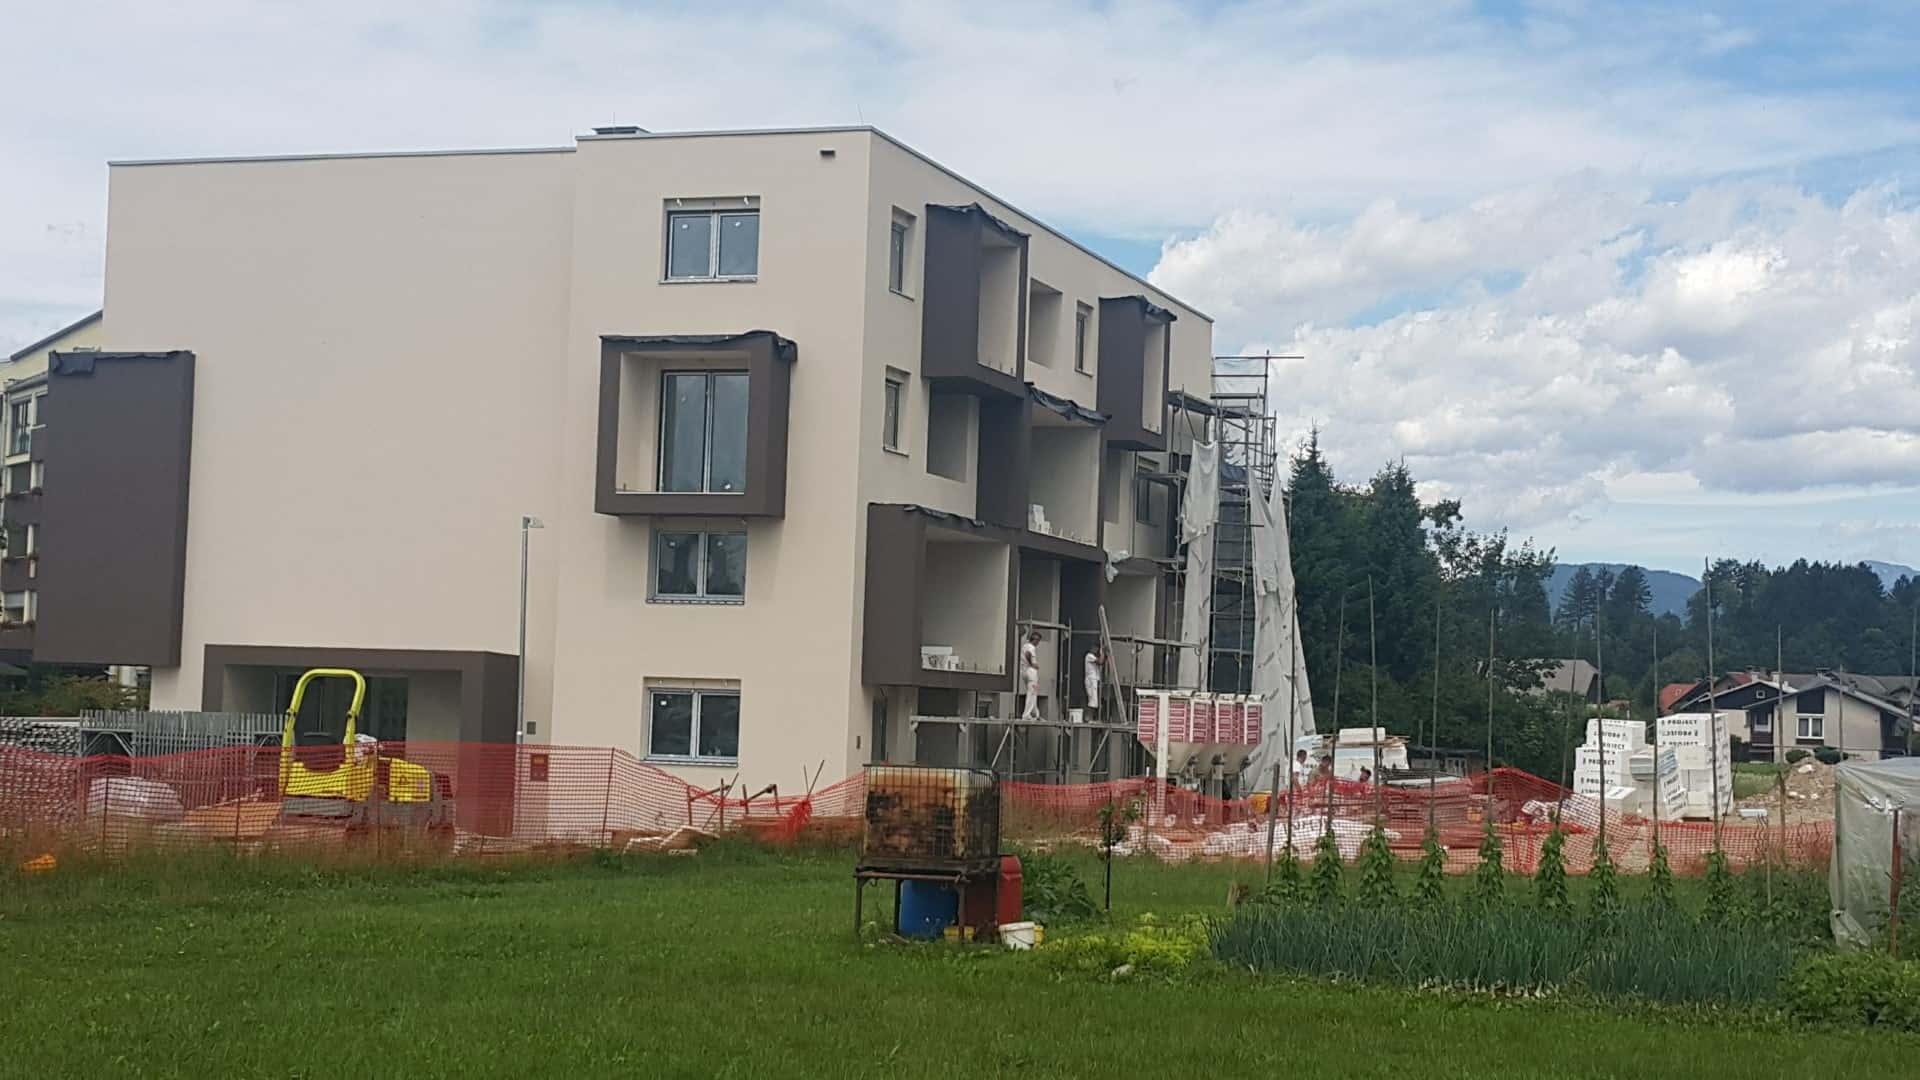 Permal doo reference Blok stanovanski radovljica -2 2019 iMode d.o.o. (Large)